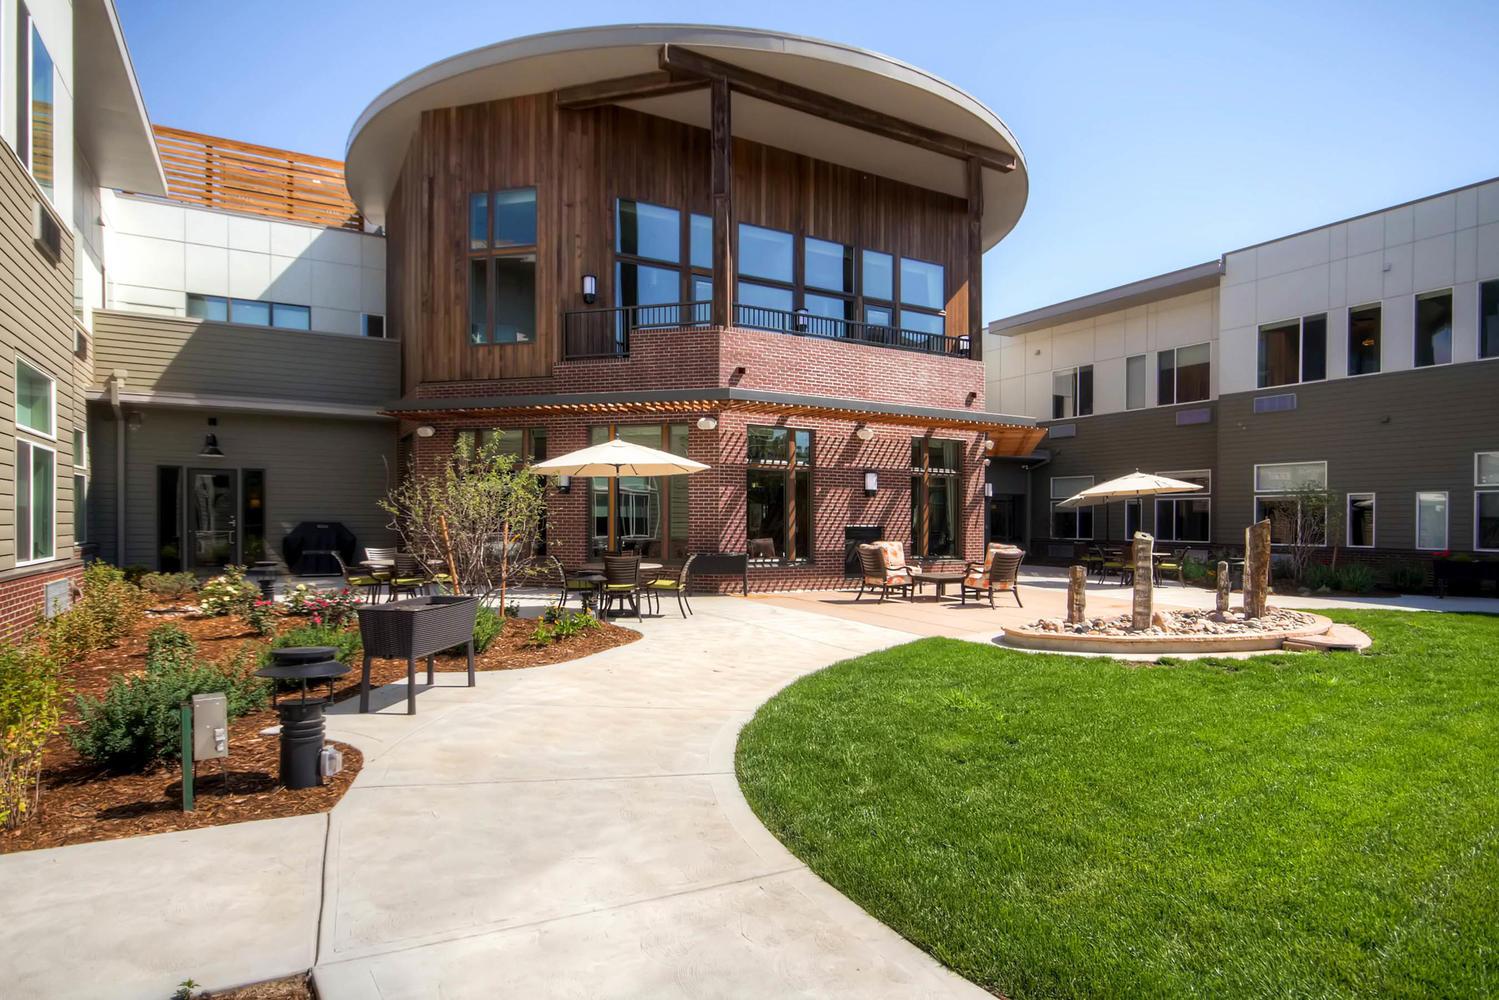 833-Jersey-Street-Denver-CO-large-030-23-Courtyard-1500x1000-72dpi